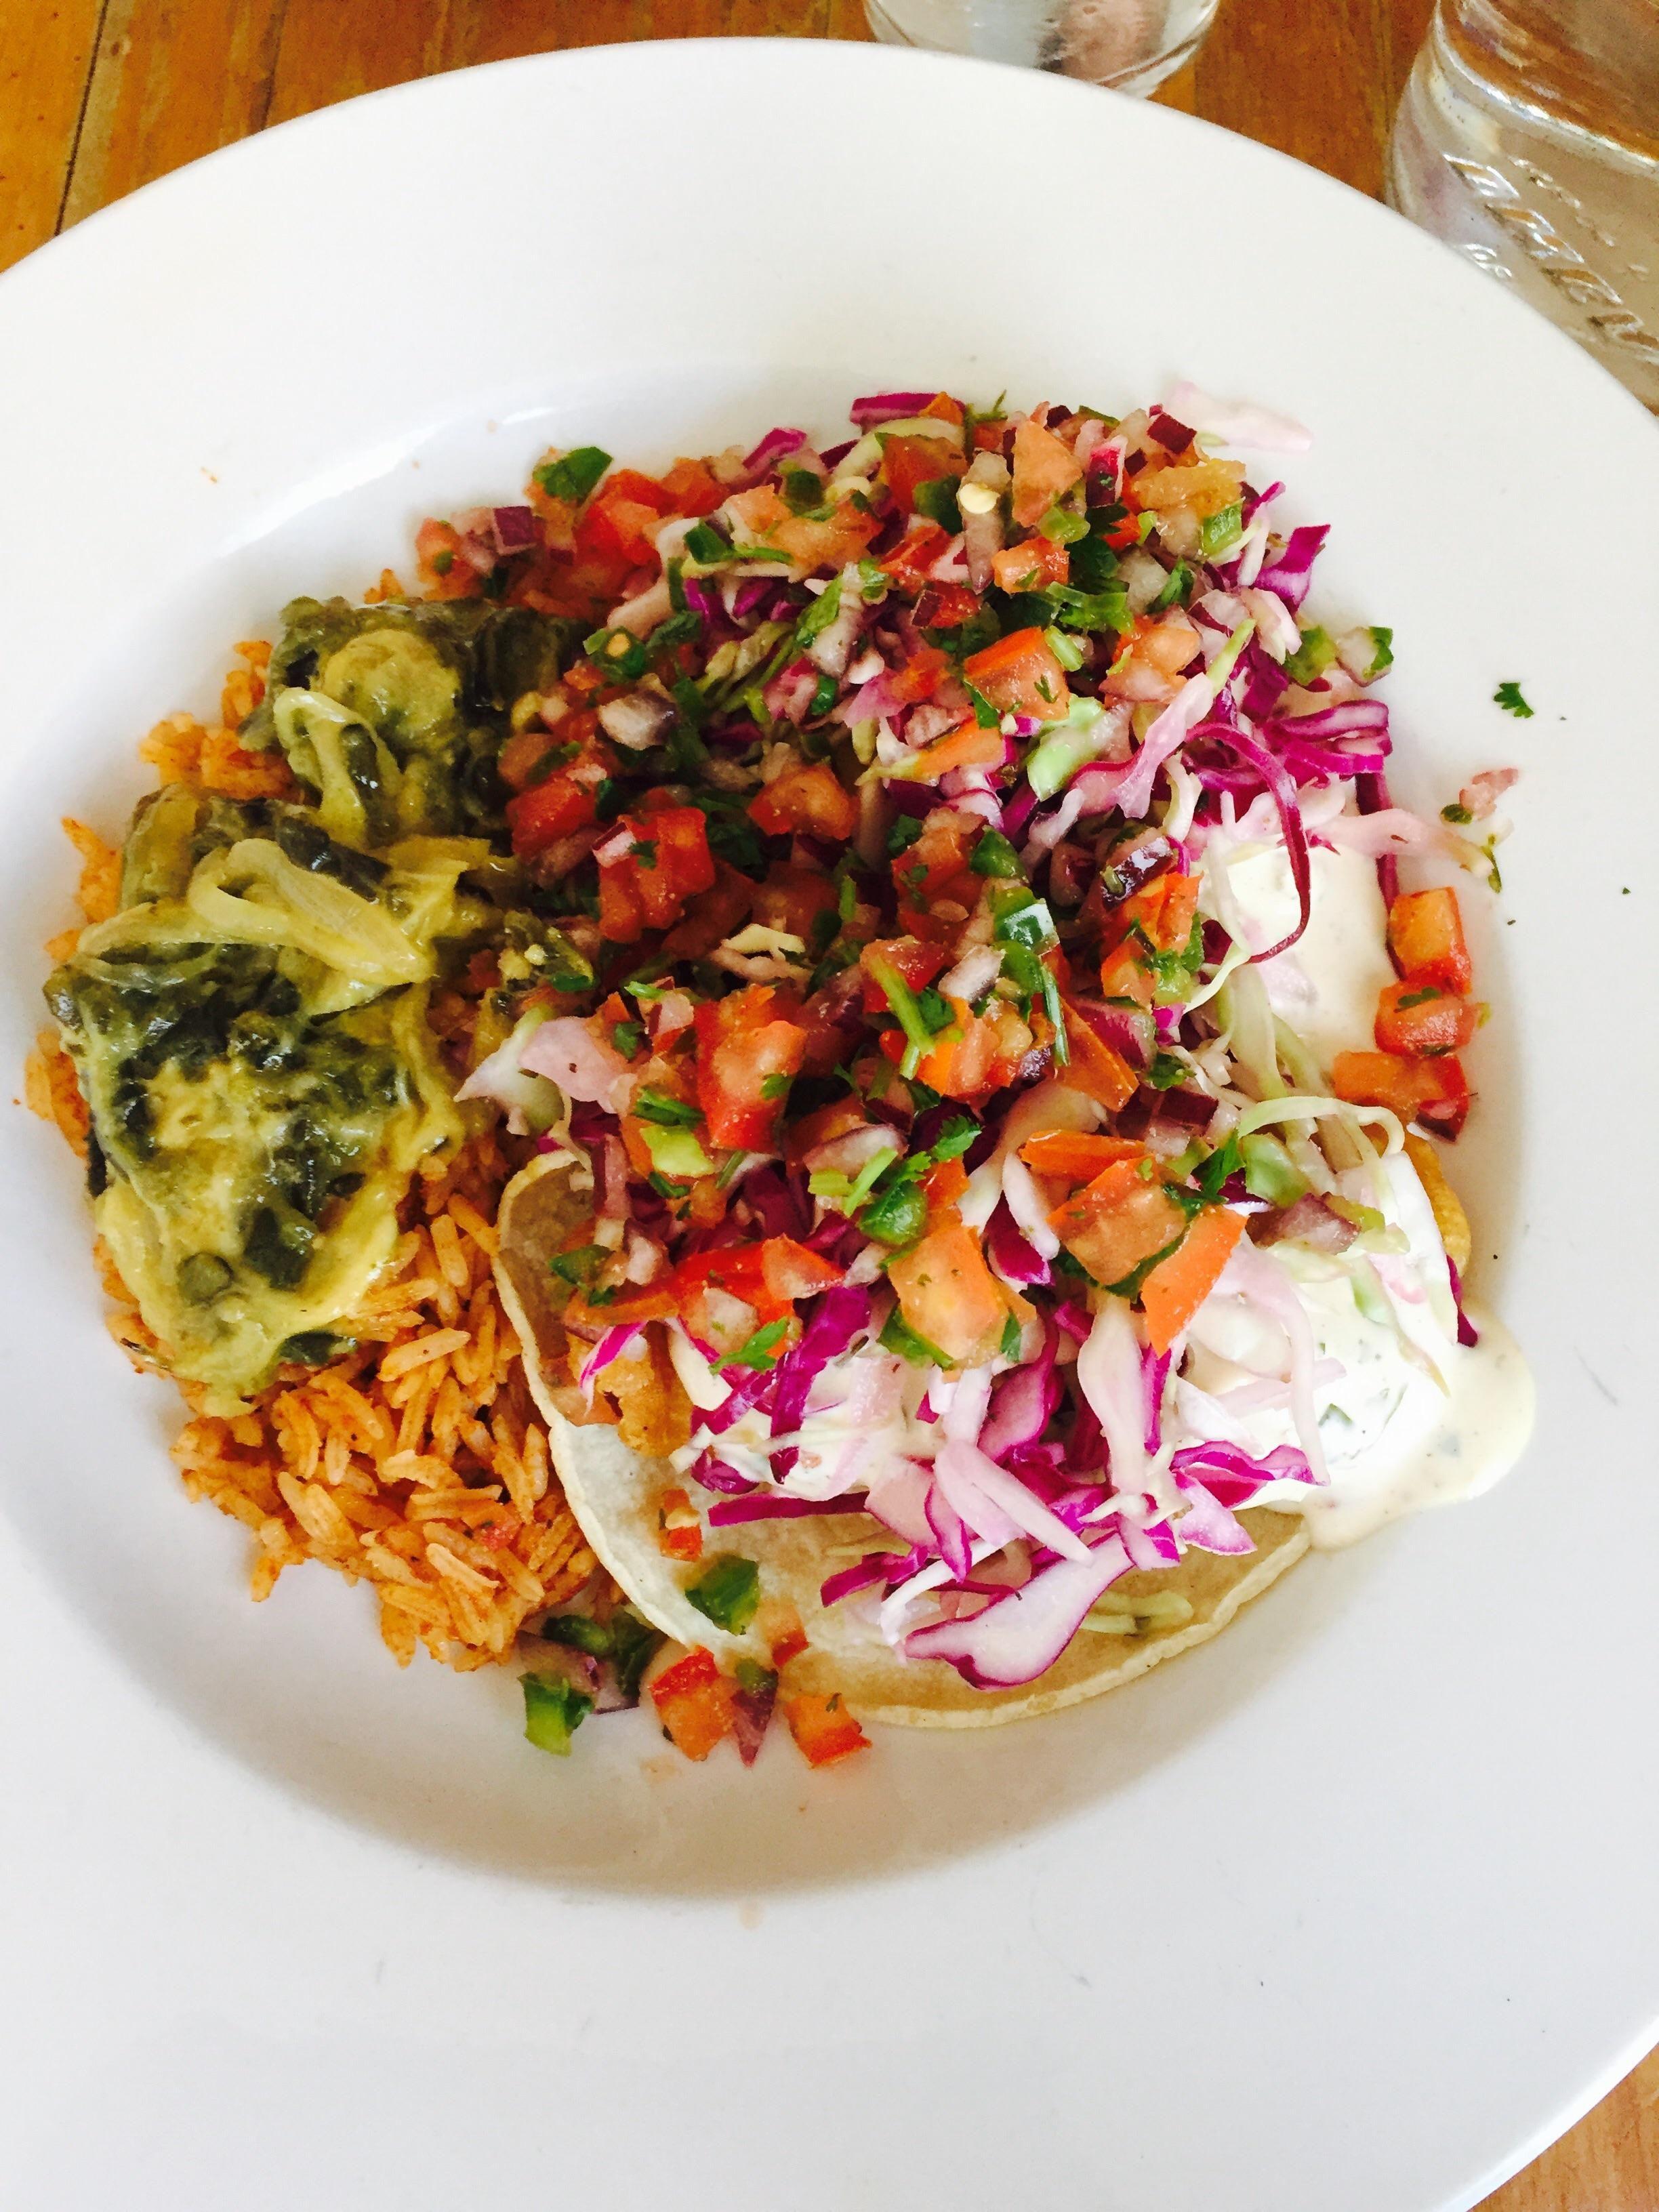 [I ATE] Baja fish & avocado tacos with pico de gallo spanish rice & rajas